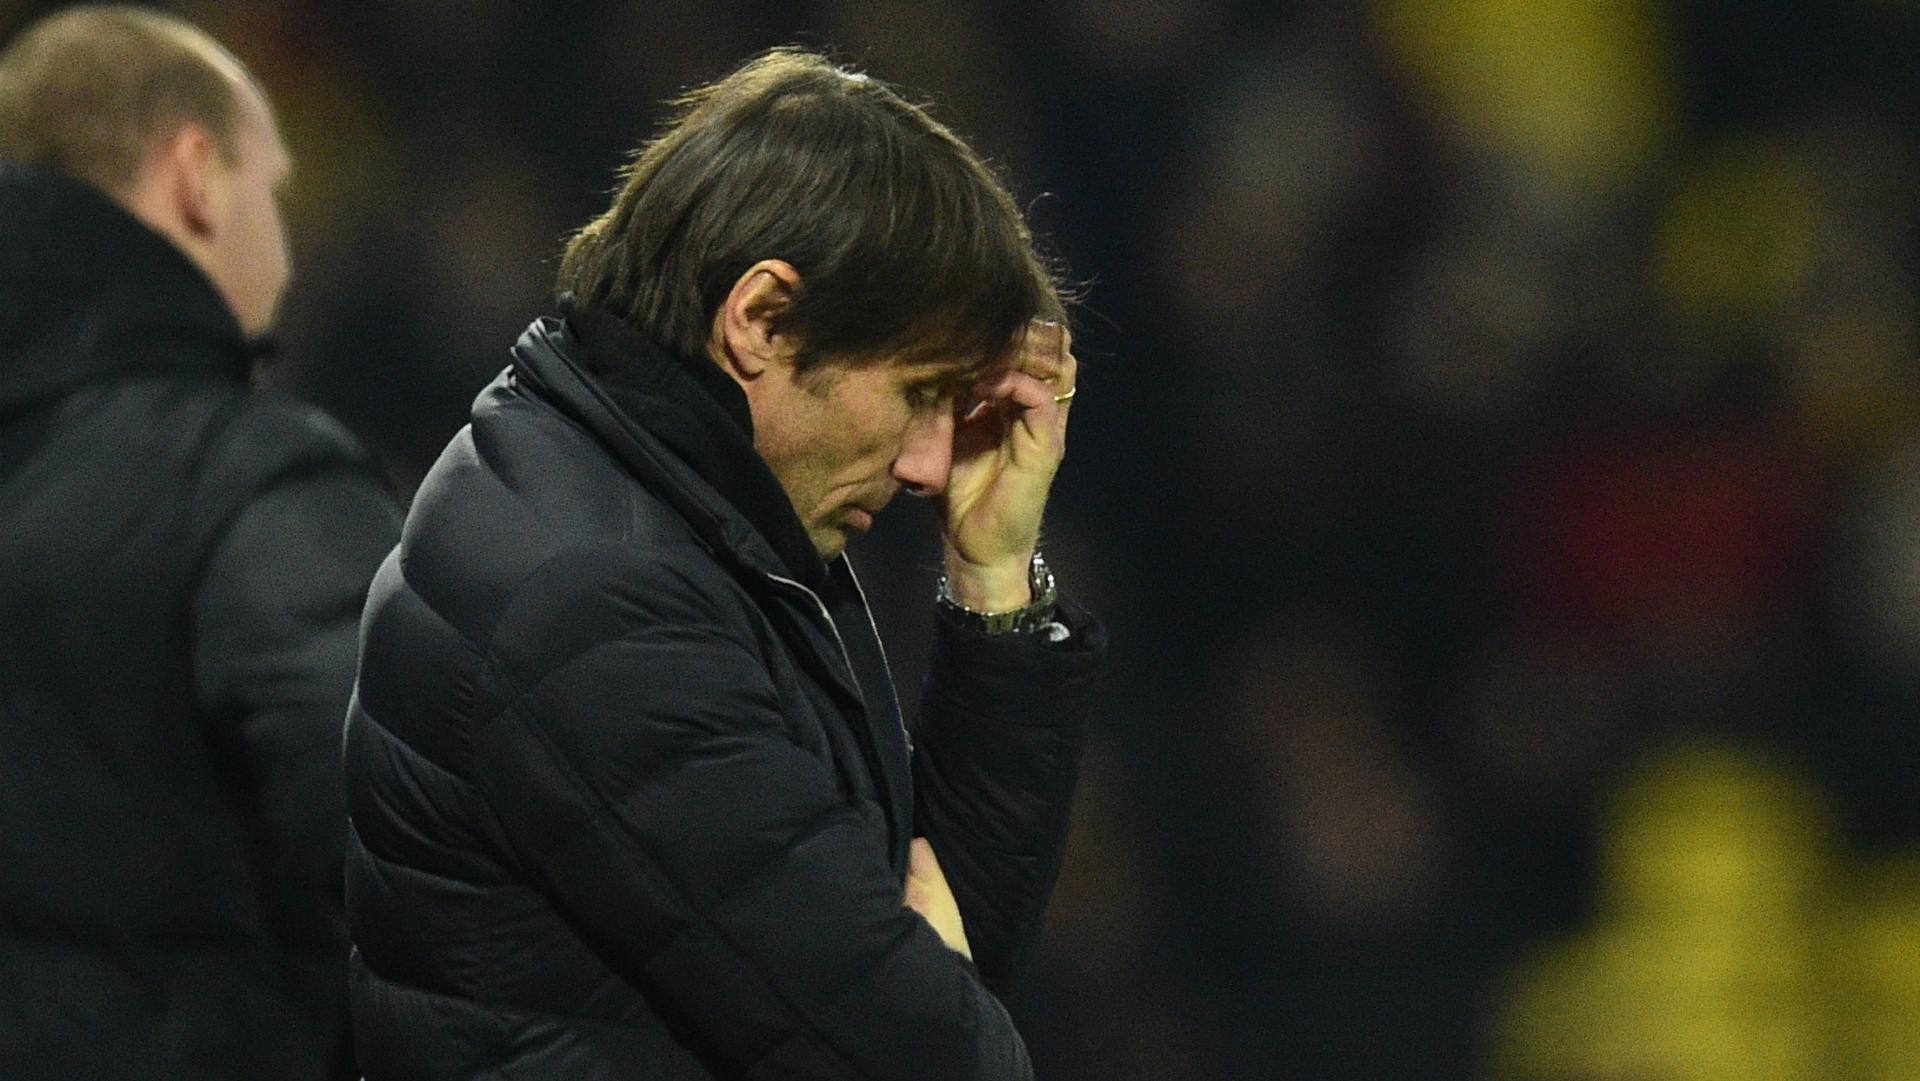 Richarlison explica por que chorou após ser substituído contra o Chelsea